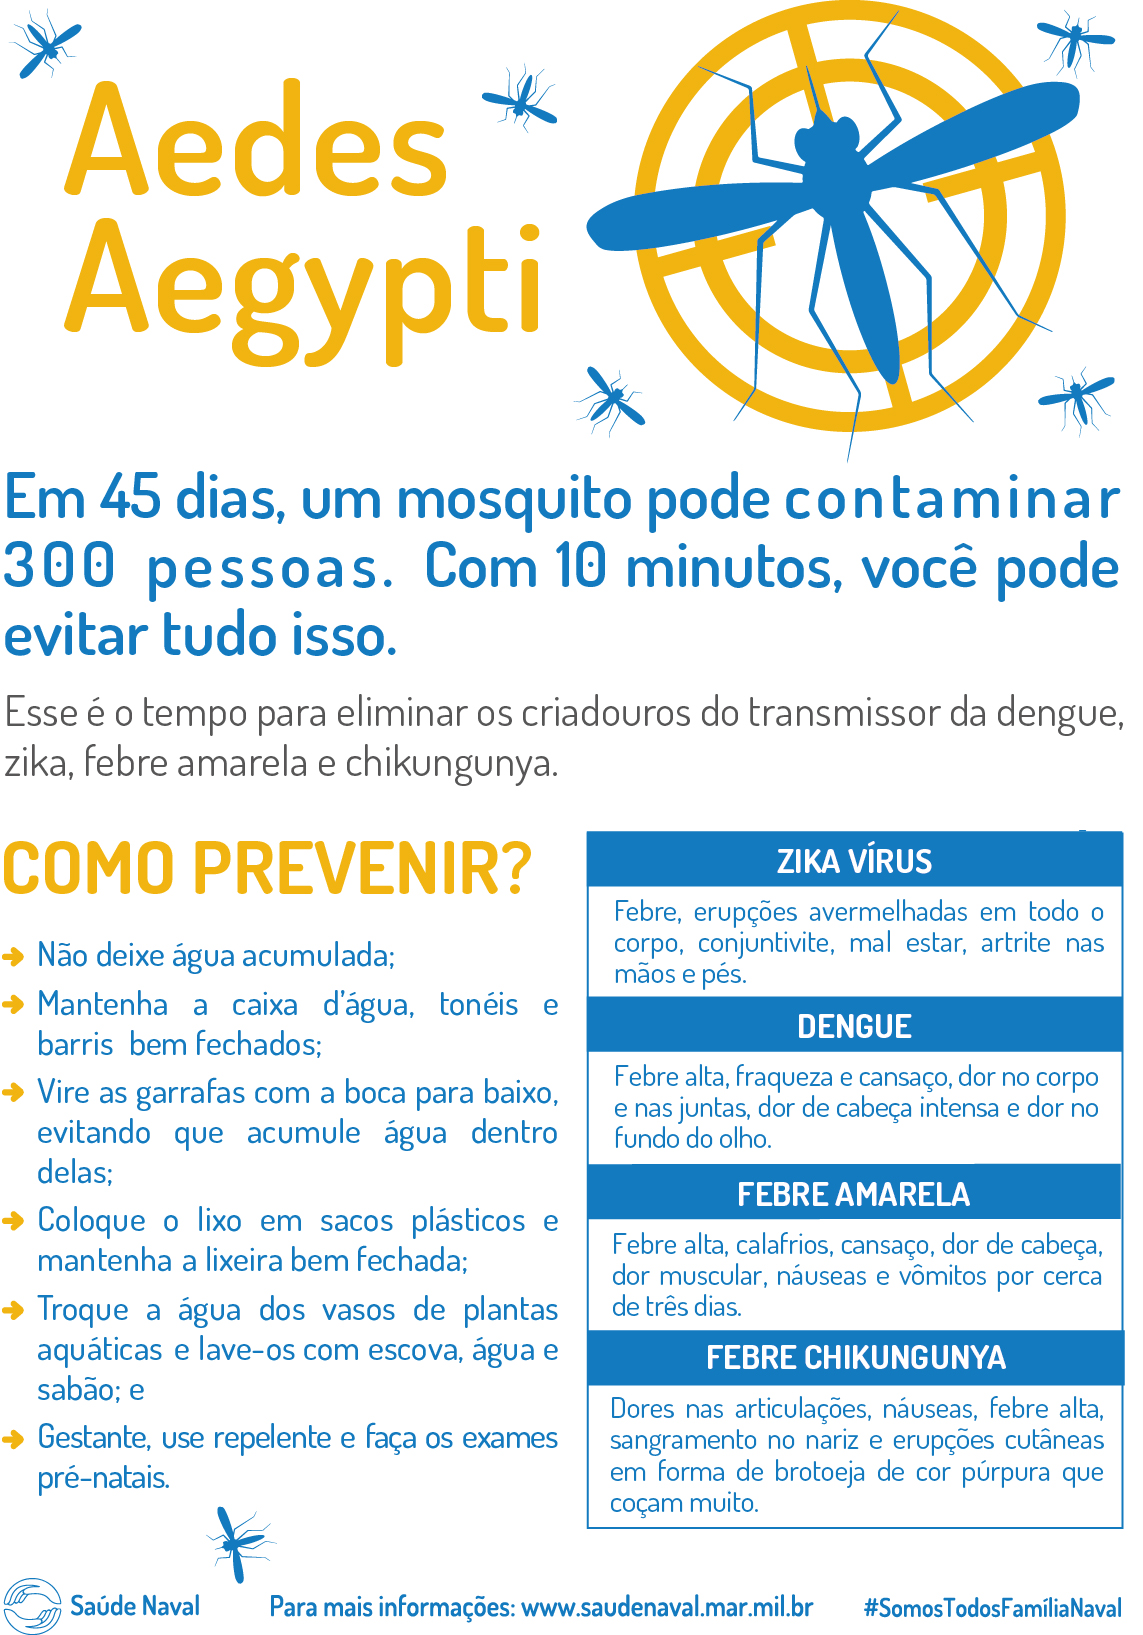 Aedes Aegypt